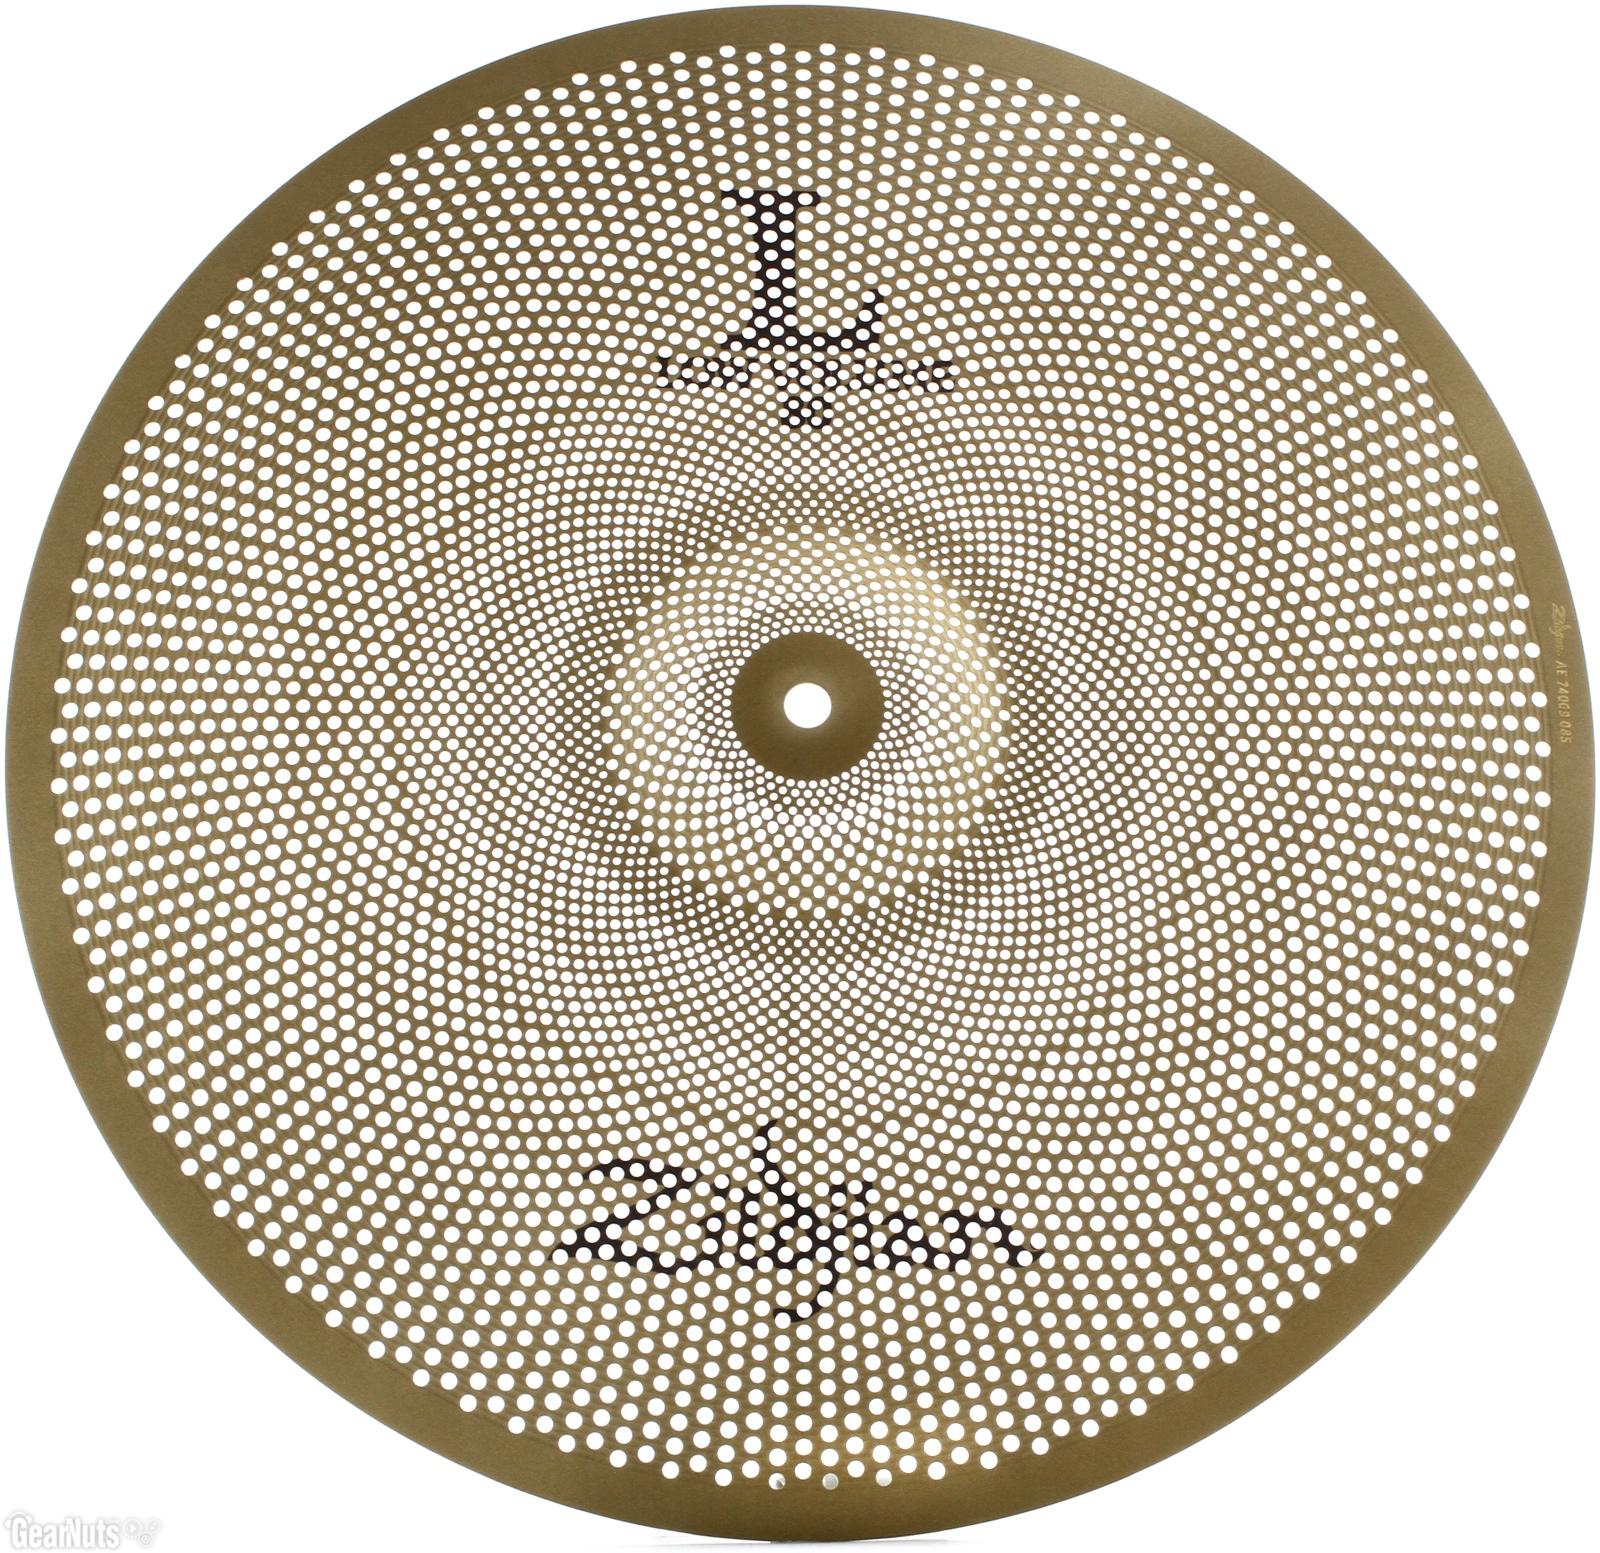 zildjian l80 low volume splash cymbal 10. Black Bedroom Furniture Sets. Home Design Ideas